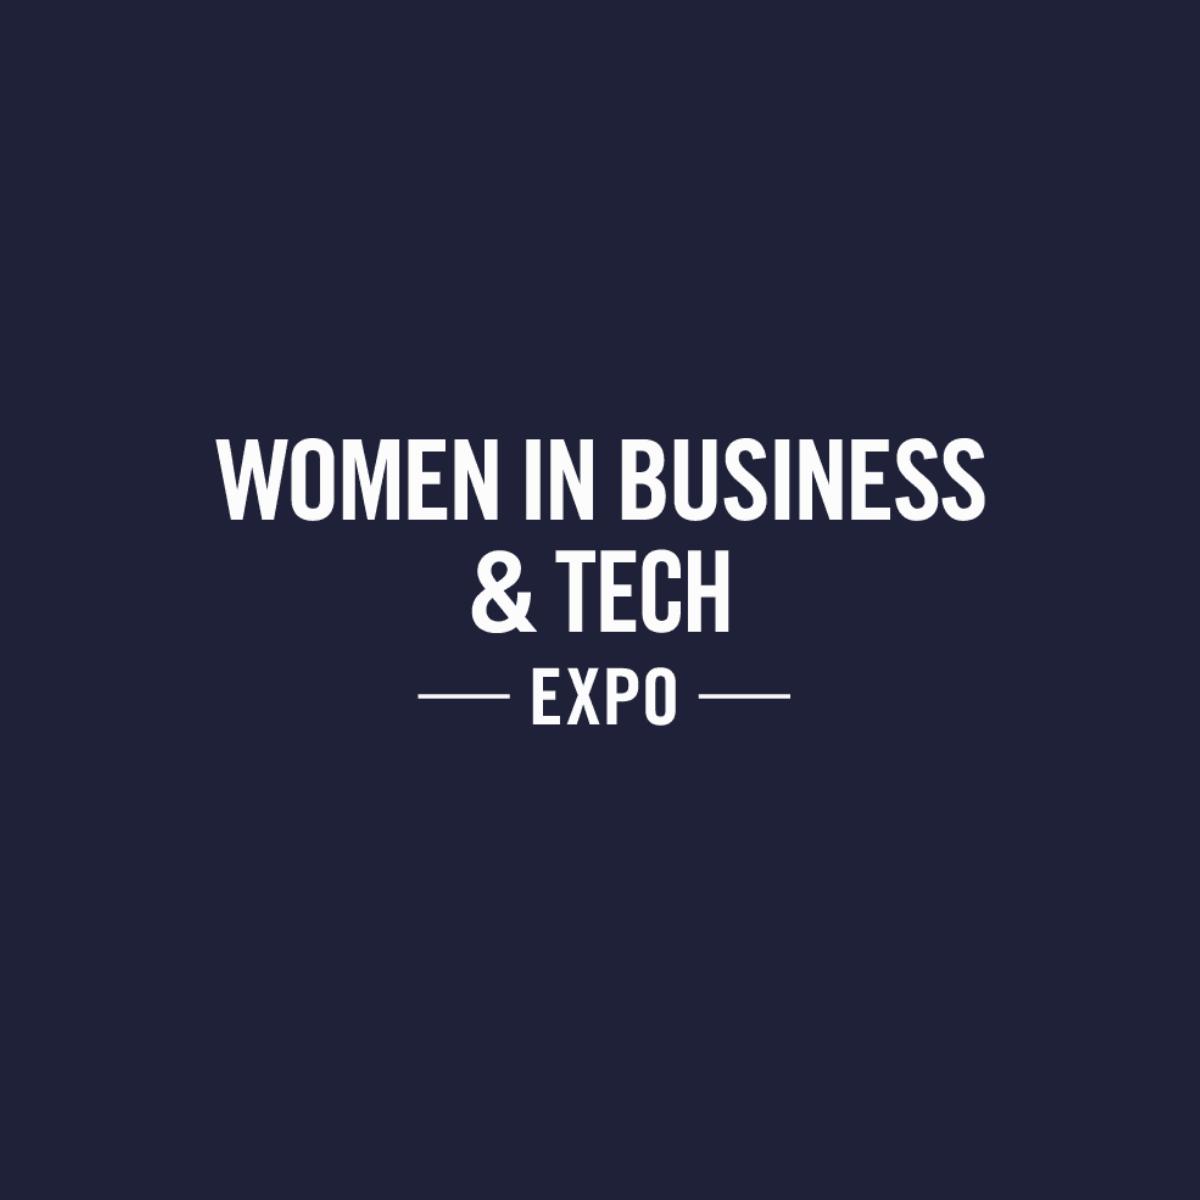 Women in Business & Tech Expo with DWEN